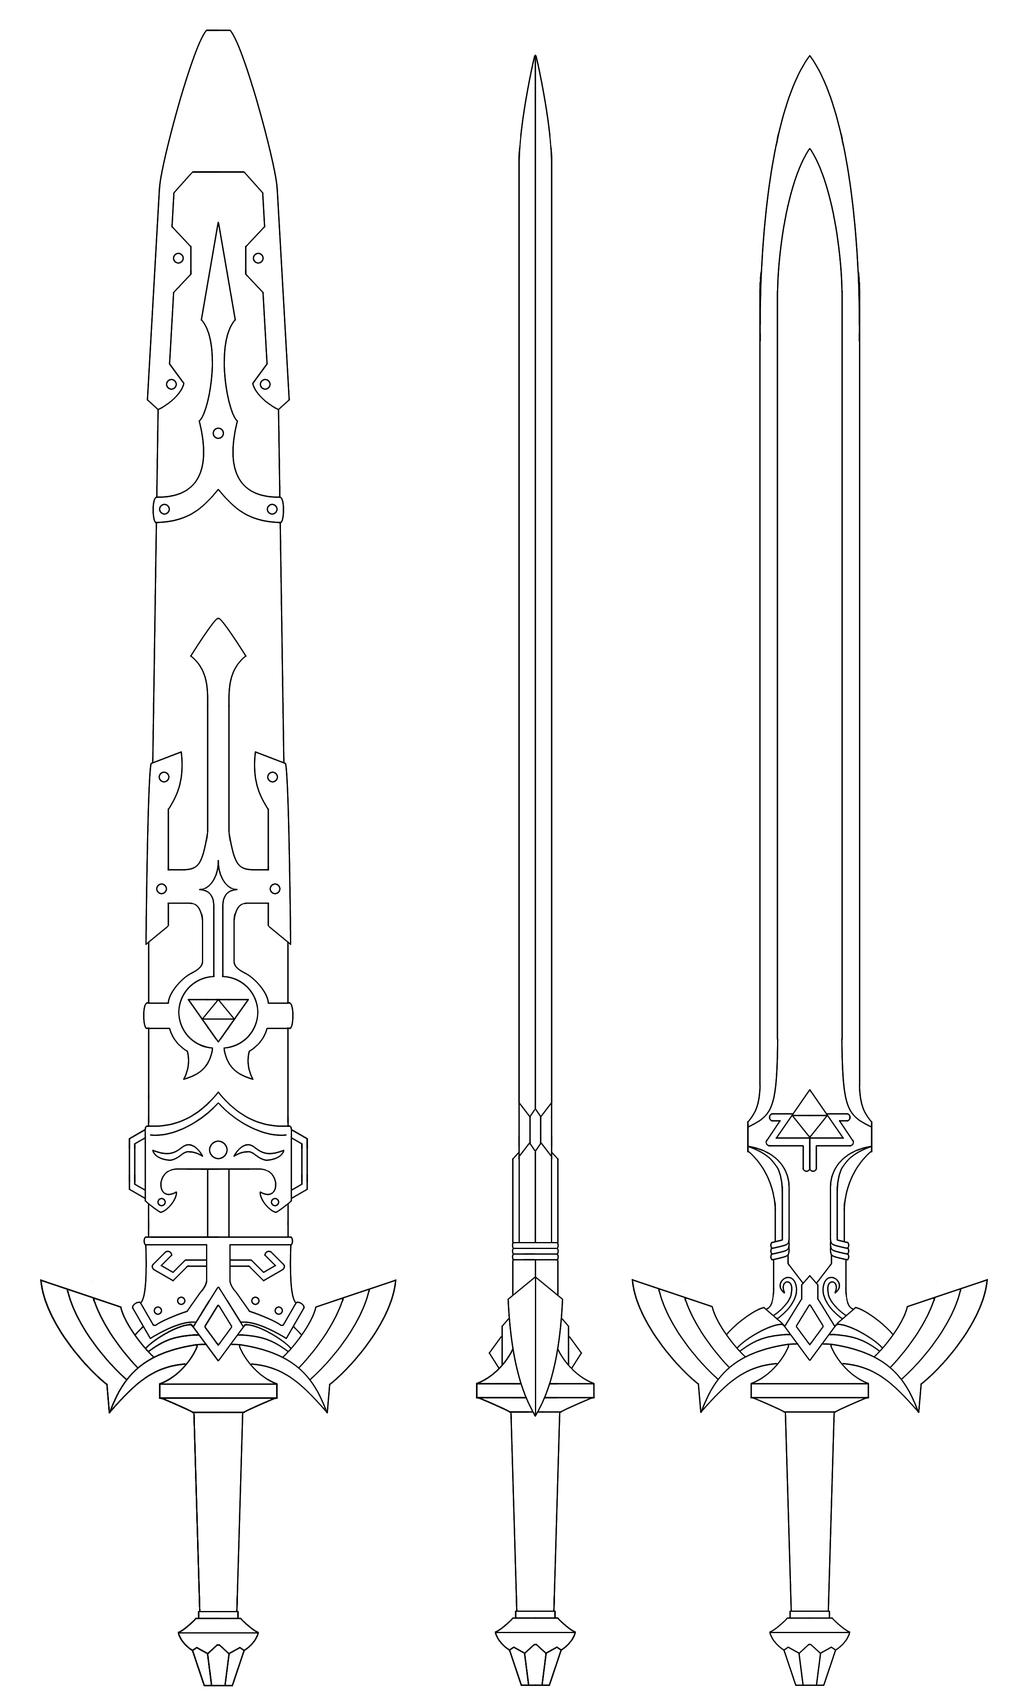 Master Sword blueprint (Twilight Princess) by fridator